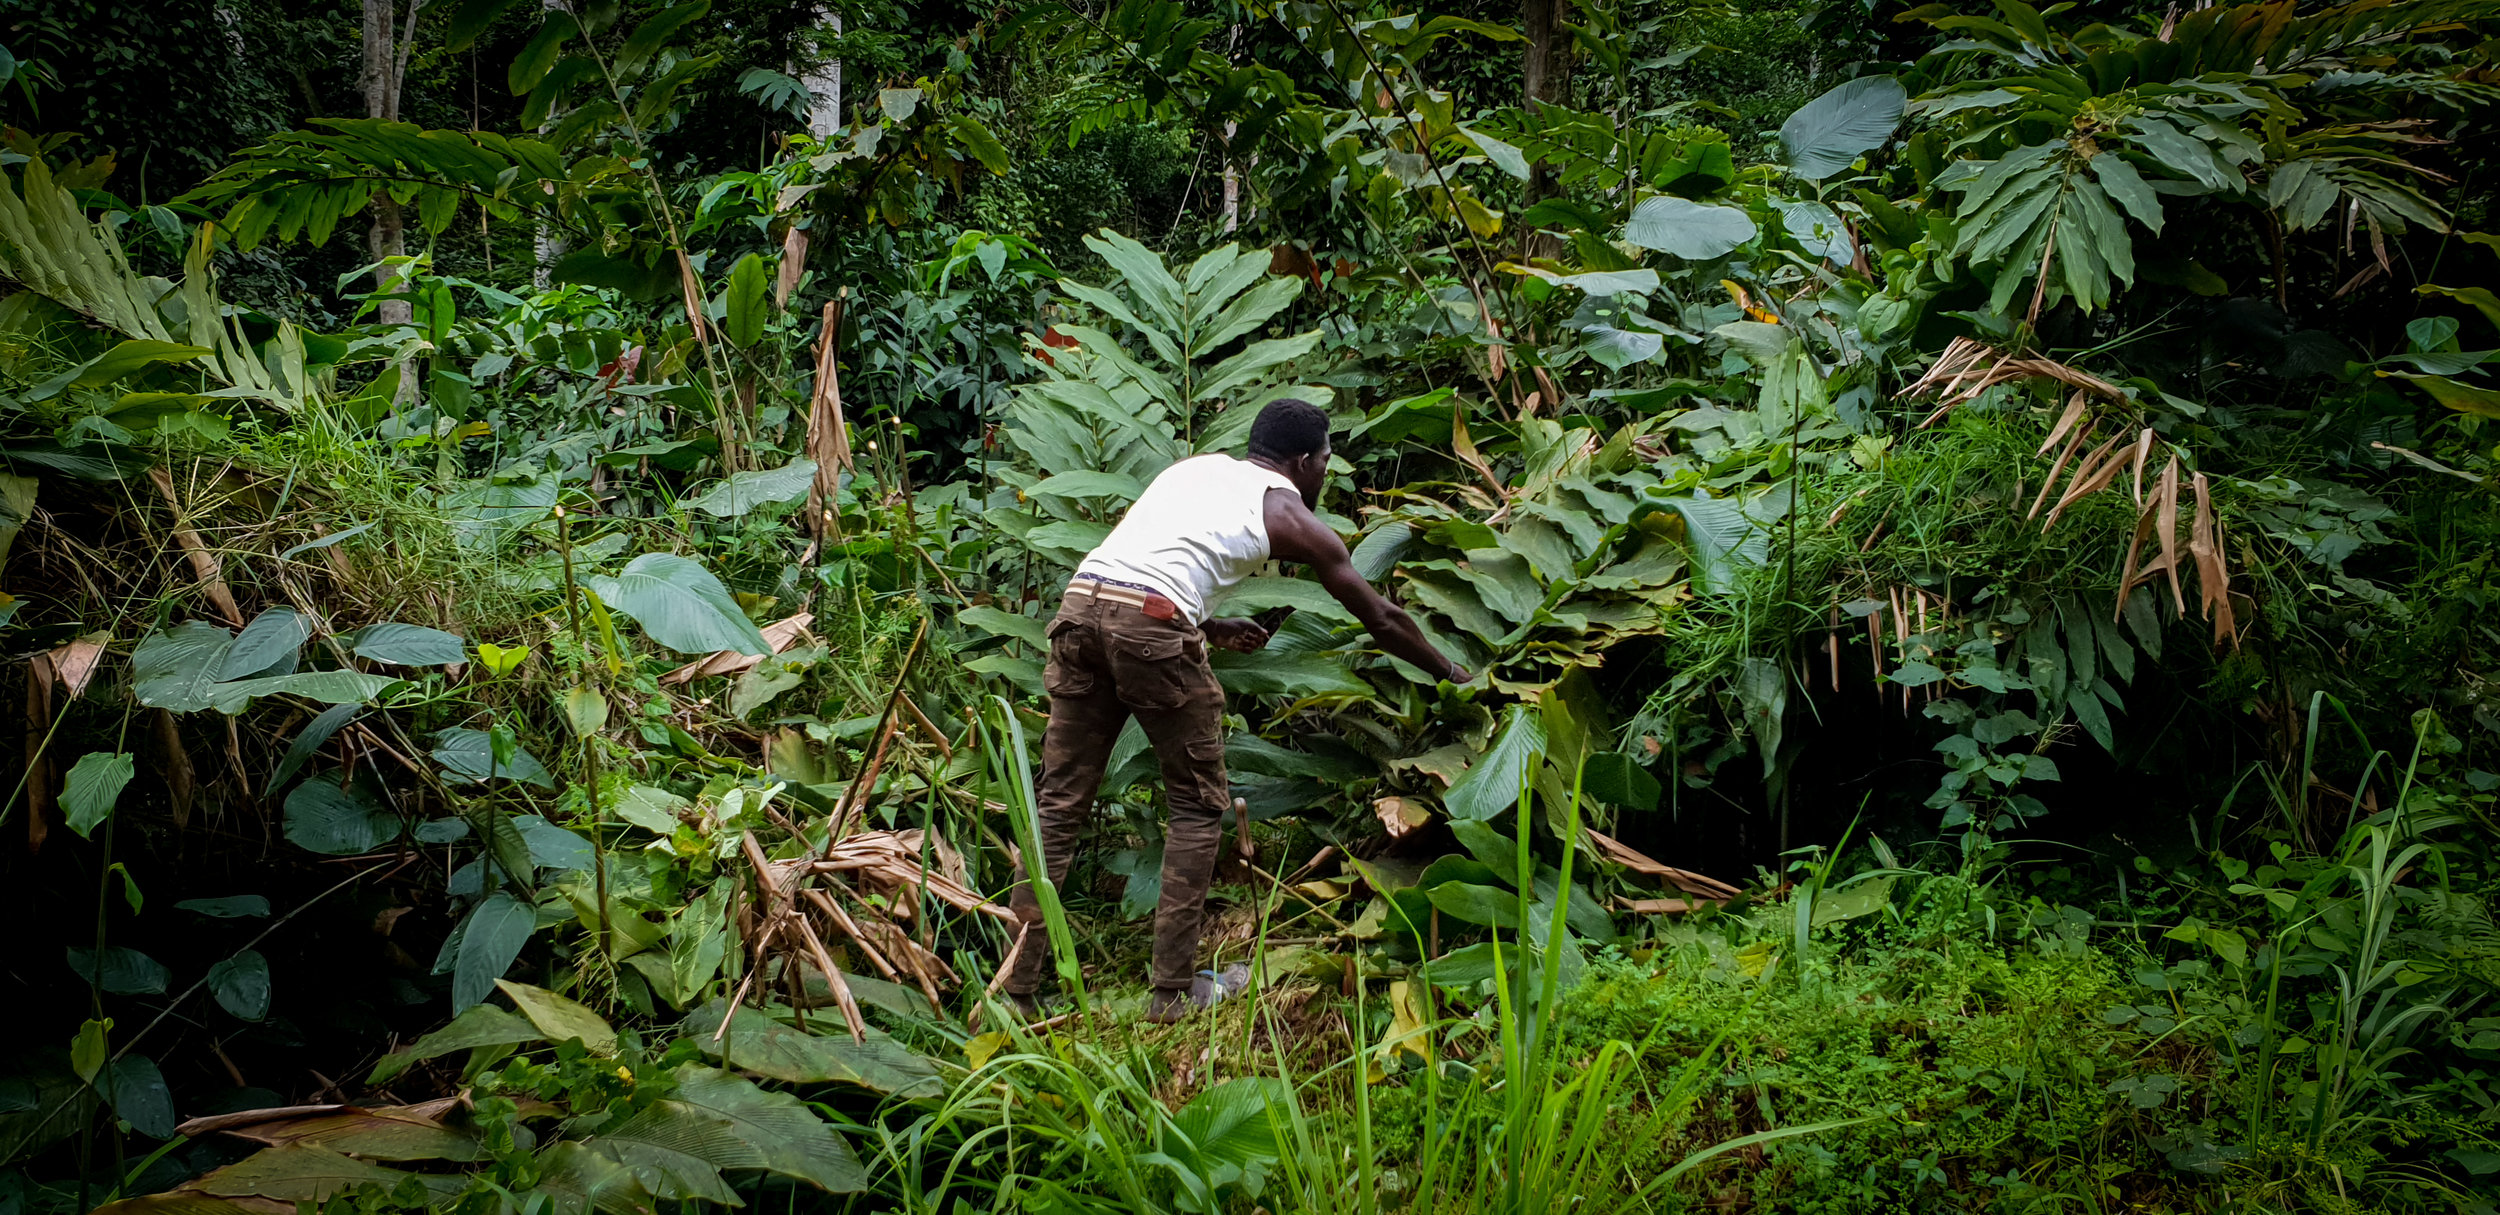 Ghislain clearing a path in the jungle